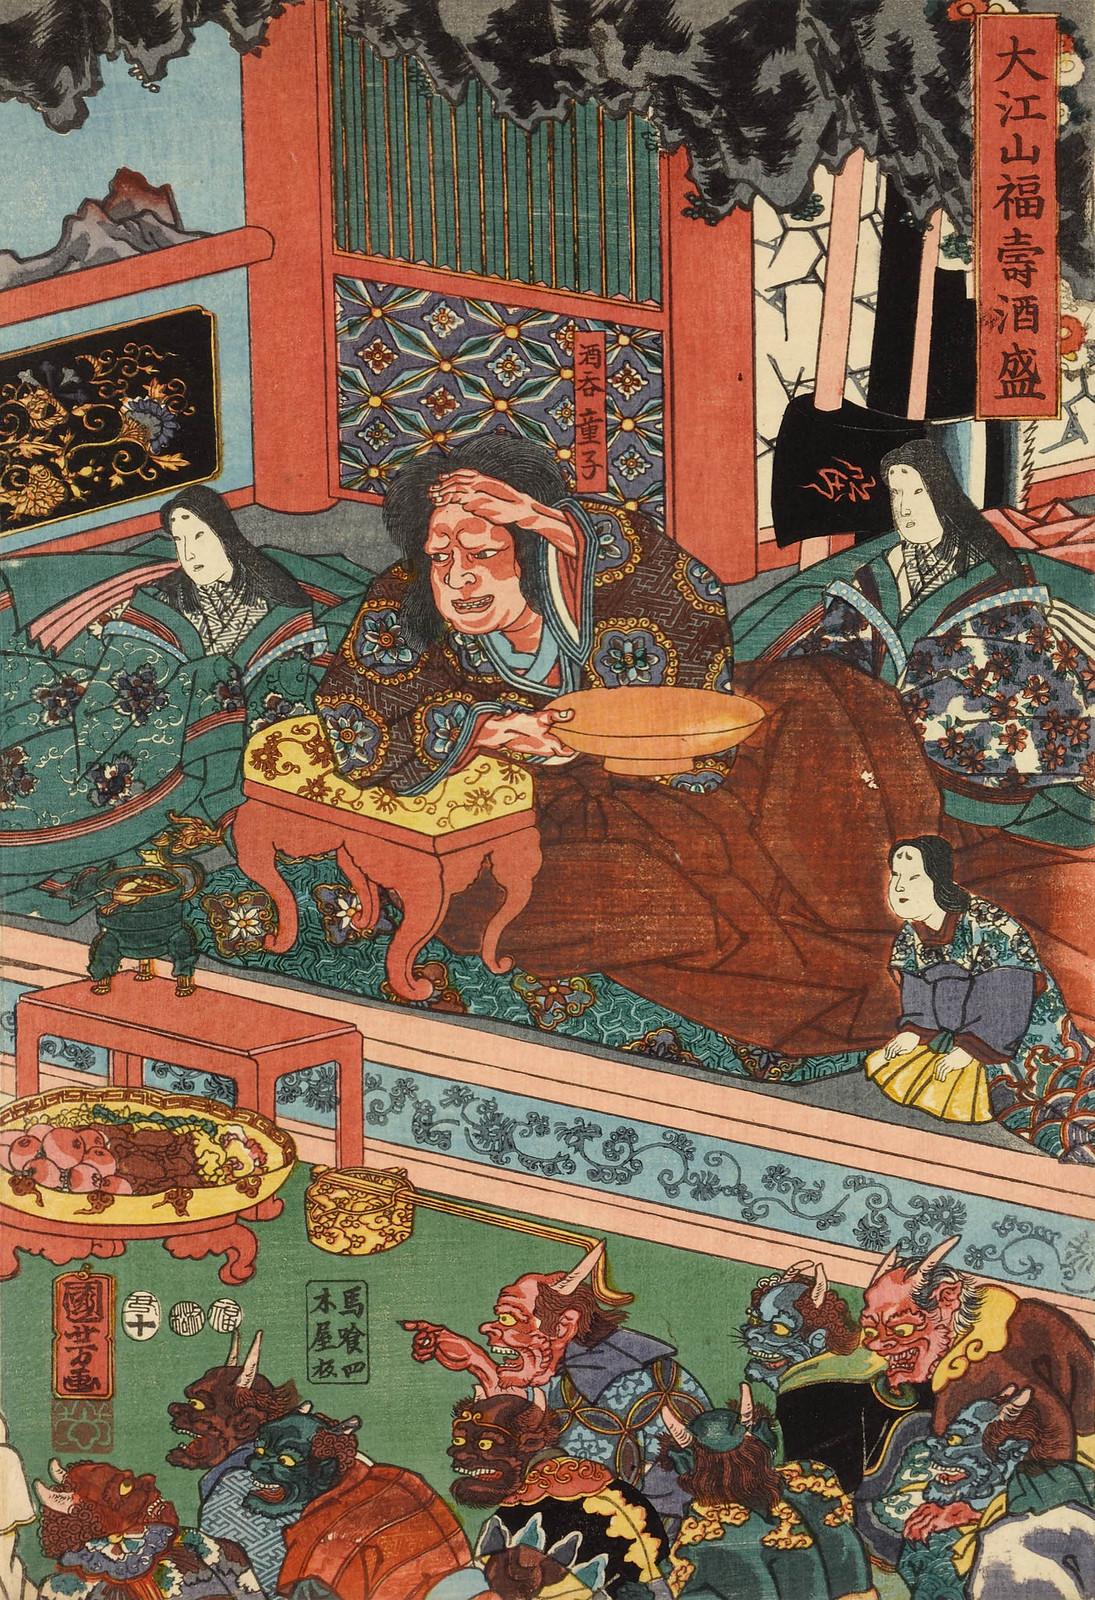 Utagawa Kuniyoshi - Raiko and his retainers entertaining the Shuten-doji and his demons with sake and dancing, 1853 (right panel)